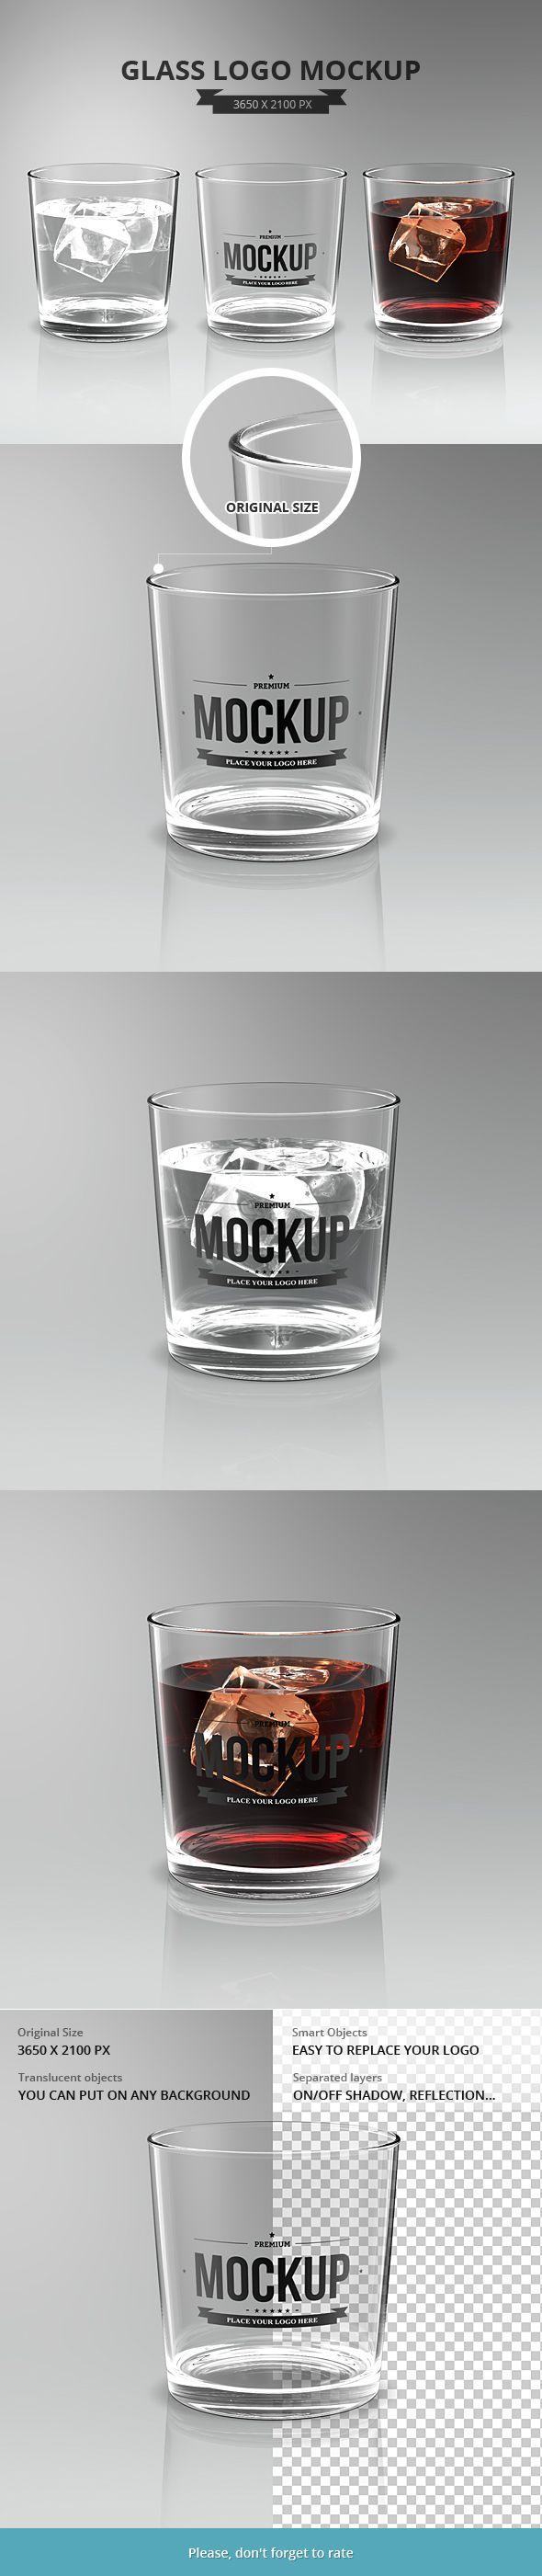 Glasses Logo Mockup. Alcohol, ayashi, champagne, clear, dinner, drink, empty, freeze, fresh, glass, glassful, label, liqueur, liquid, mock up, mock-up, mockup, packaging, transparent, vodka, vodka mockup, water, whiskey, whisky, white, wine, wineglass #mockup